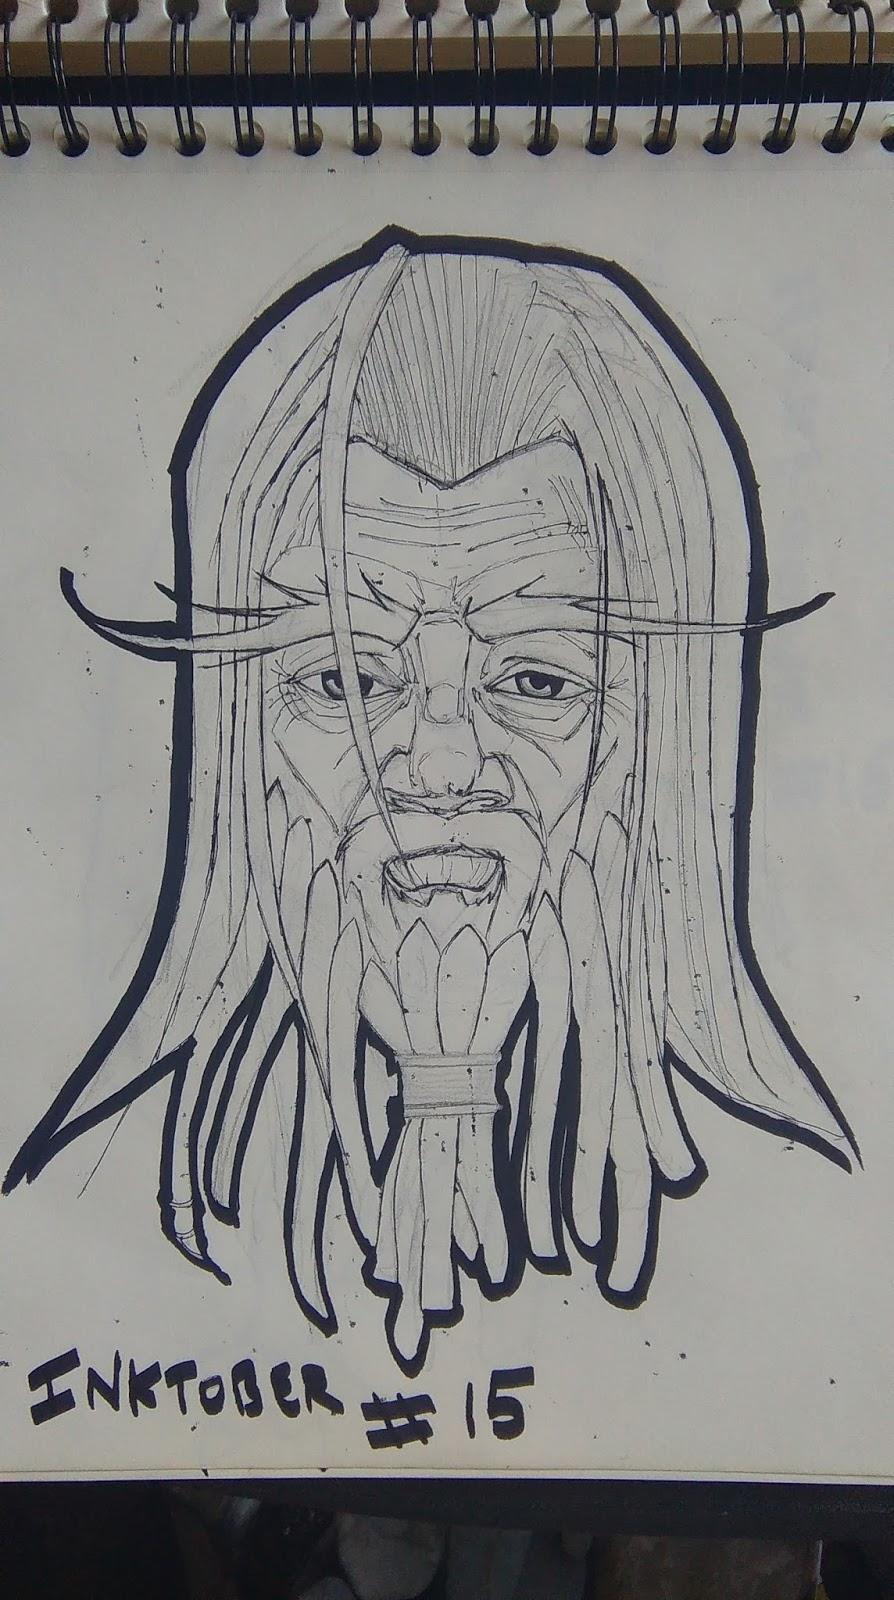 [SPOLYK] - Geometries & sketches IMAG0015